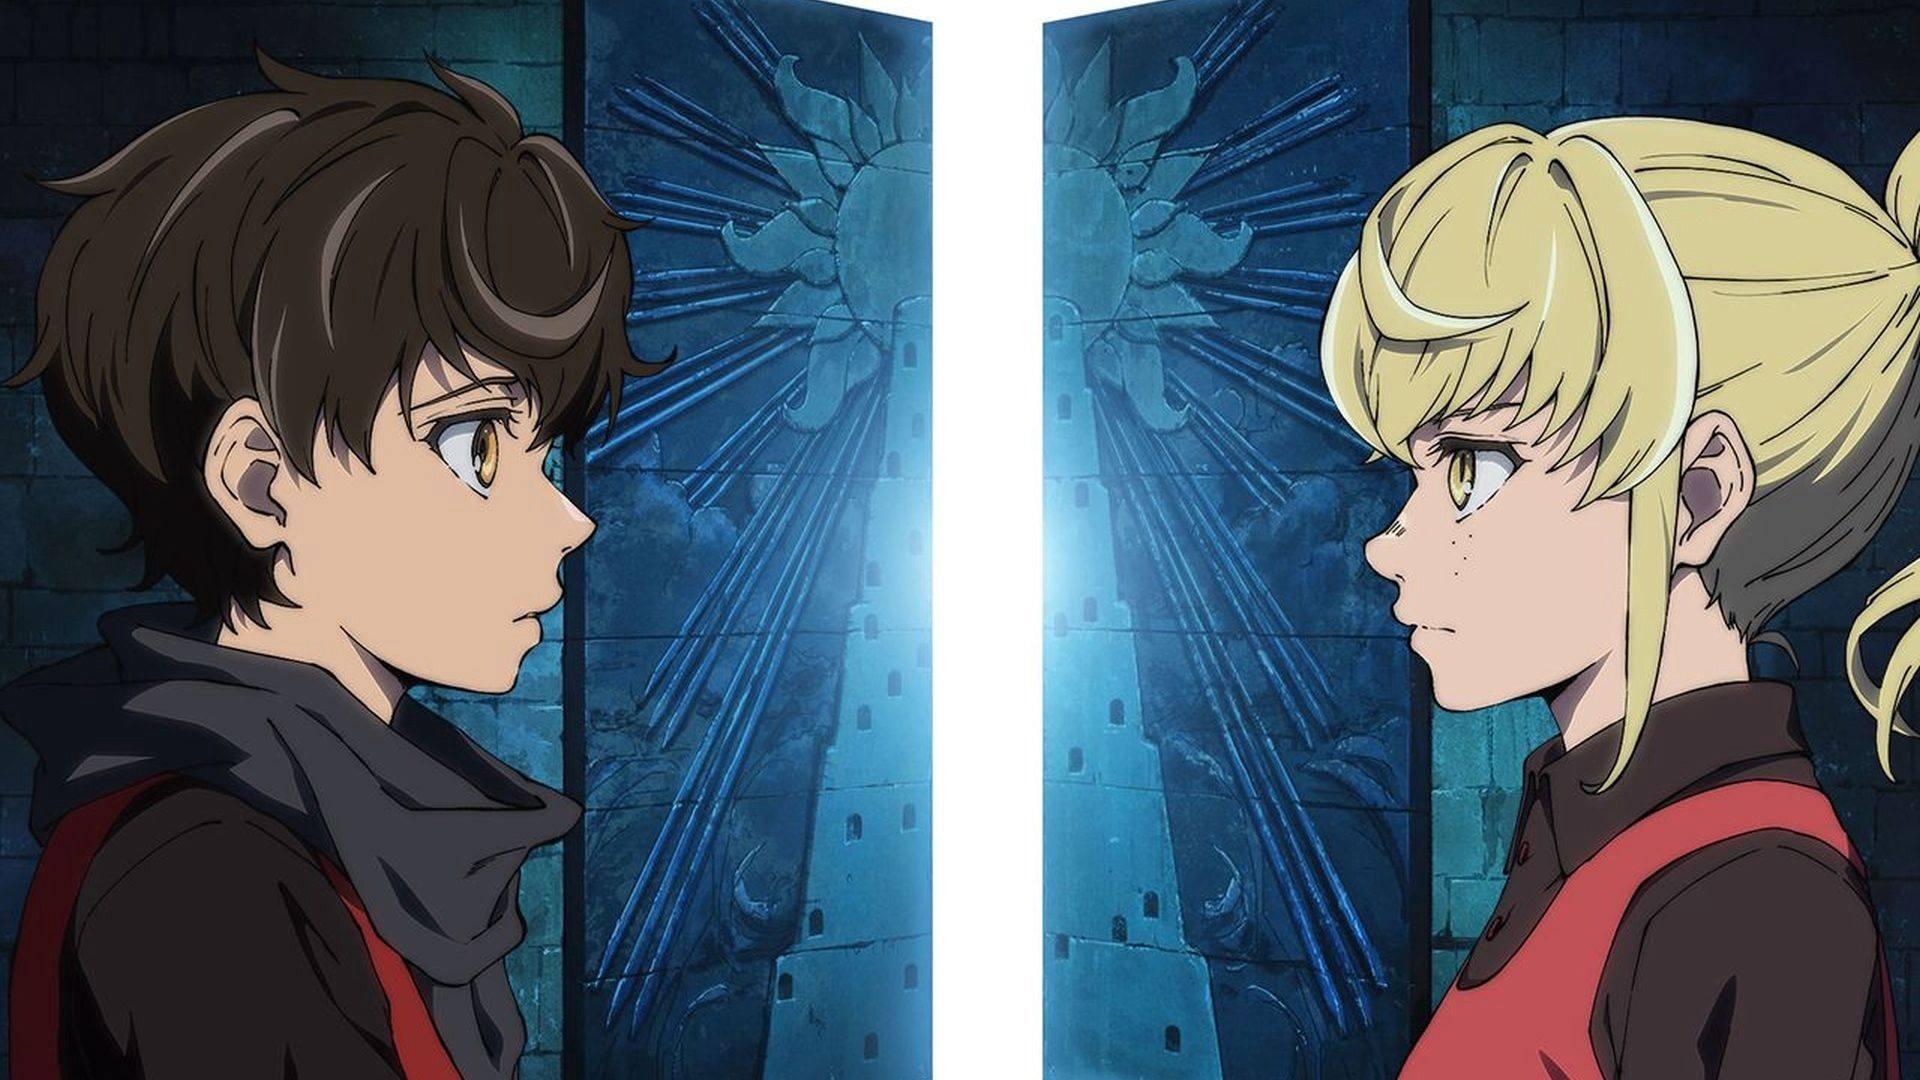 Tower of God, Season 1 Anime – রিভিউ, আশা/হতাশা, ২য় সিজন নিয়ে আকাঙ্ক্ষা, এবং ১ম সিজনের গল্প নিয়ে সামান্য স্পয়লারযুক্ত আলোচনা – Tahsin Faruque